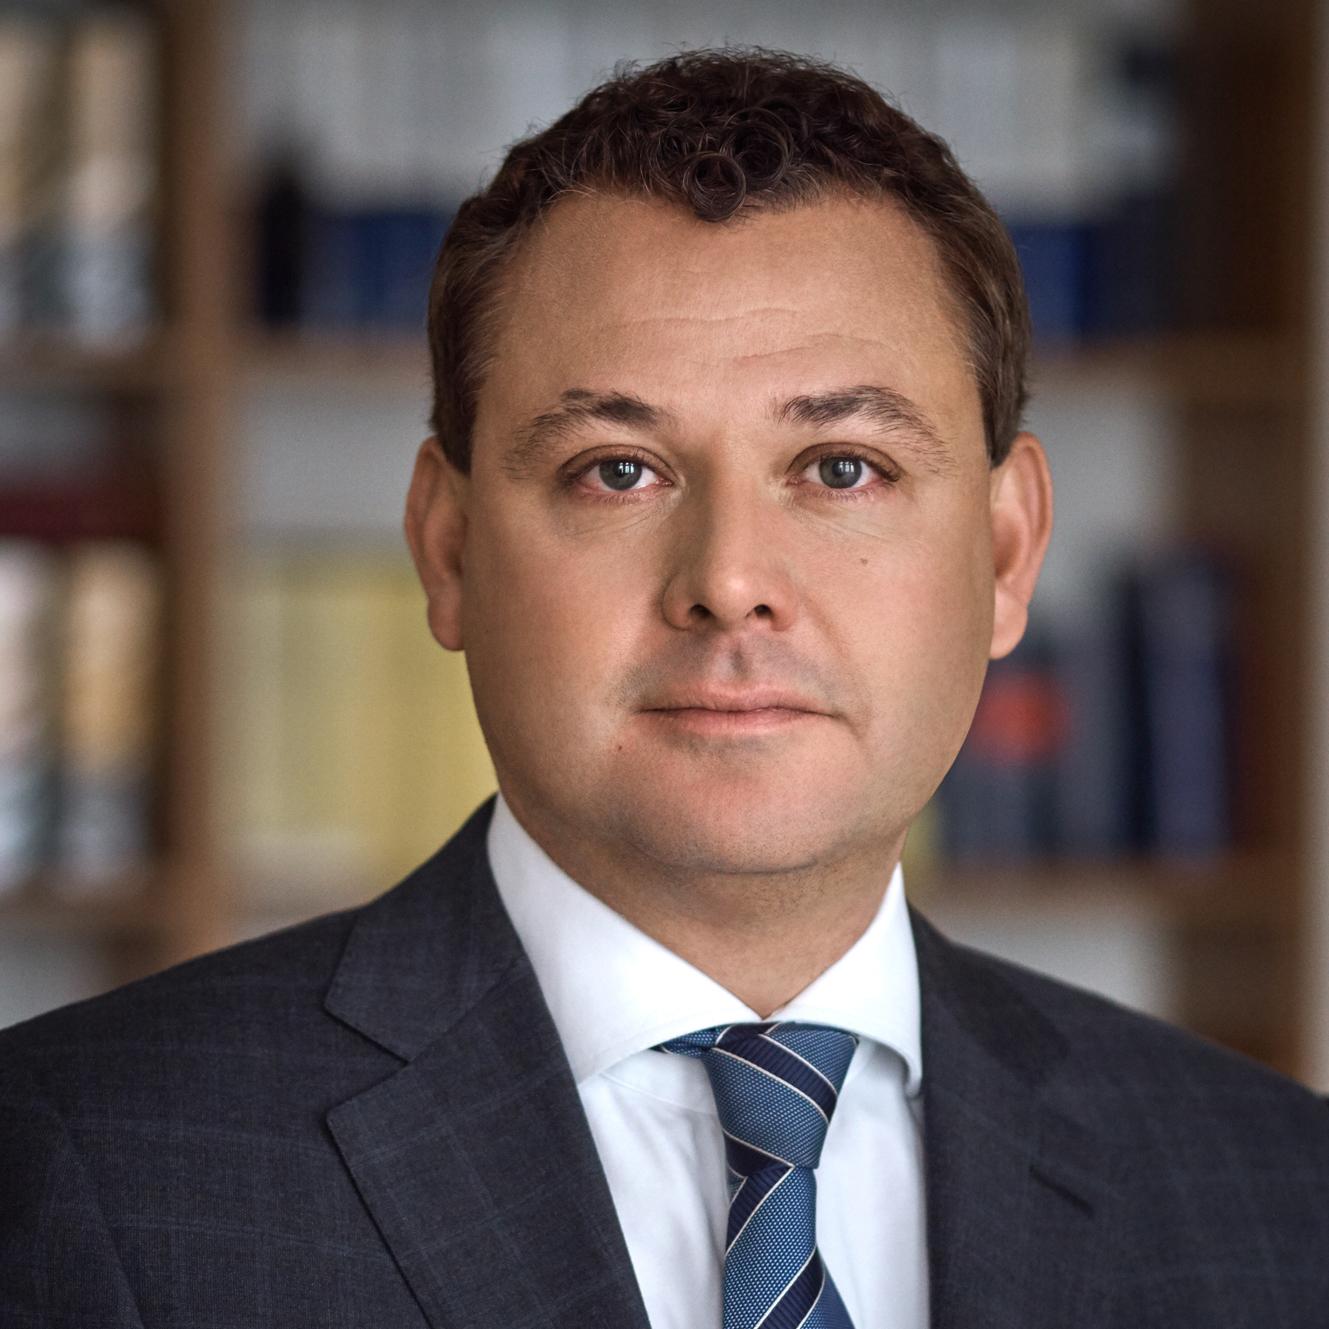 Univ.-Prof. Dr. Andreas Vonkilch